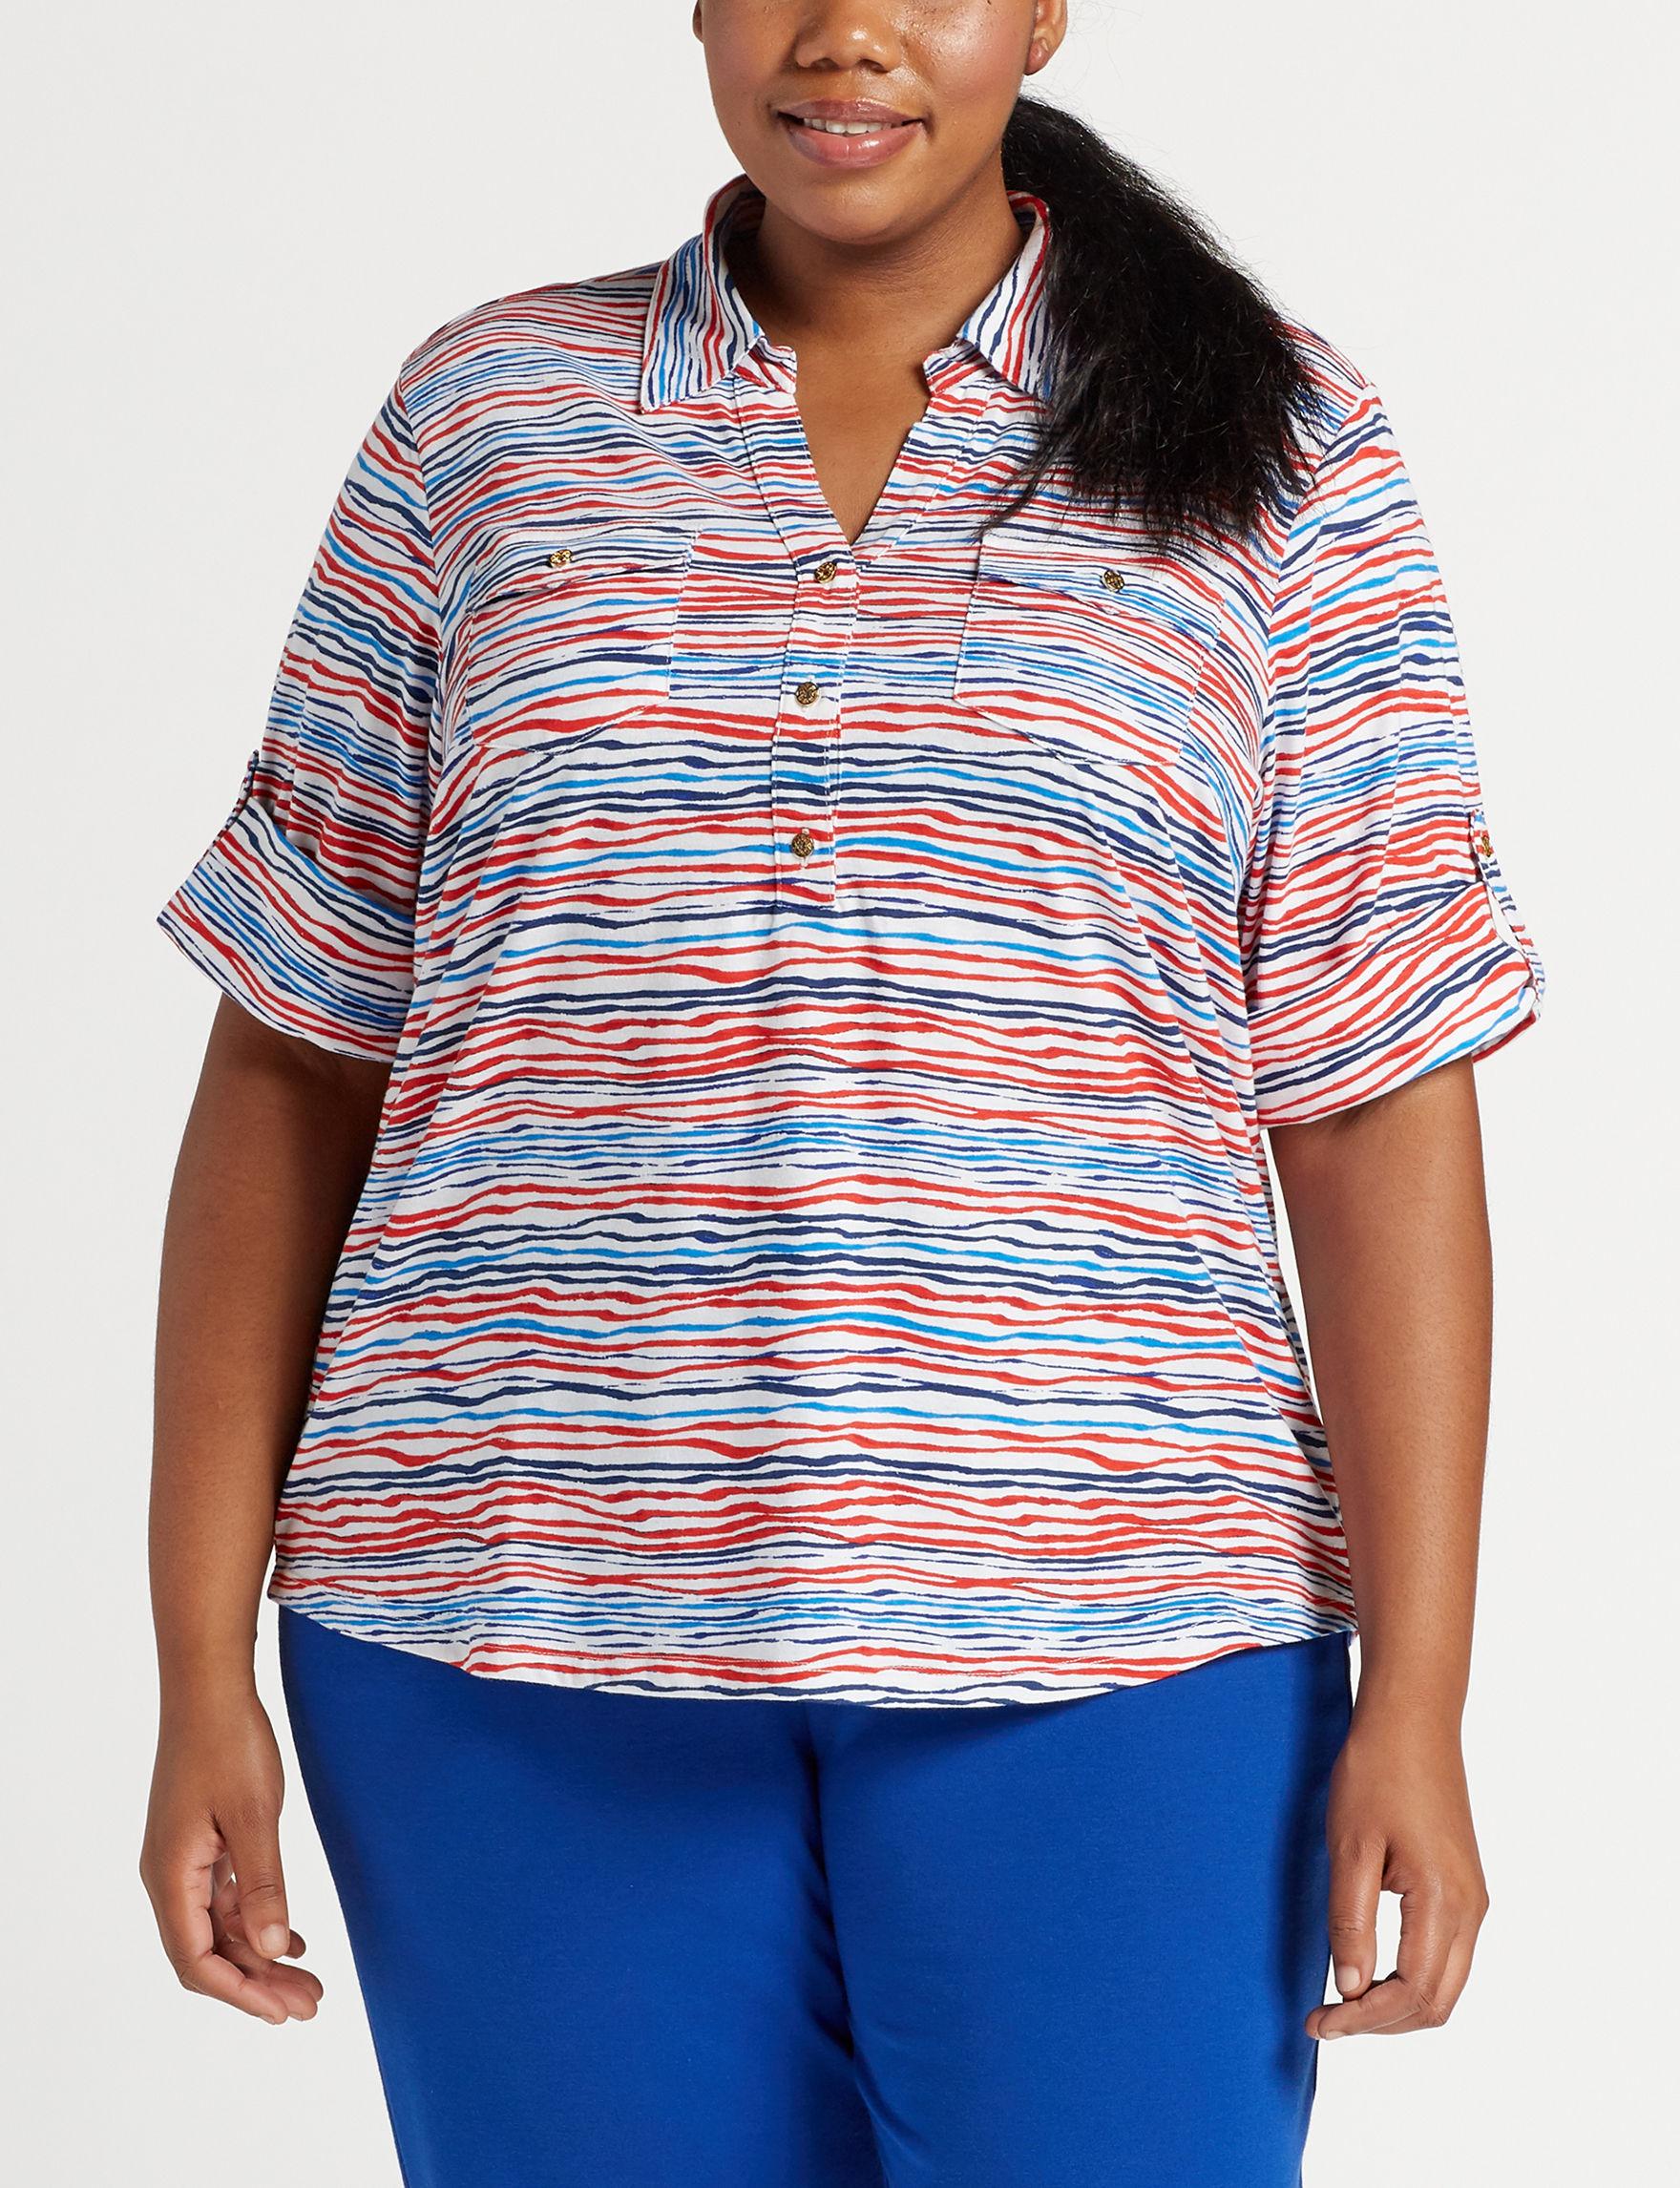 Cathy Daniels White Multi Shirts & Blouses